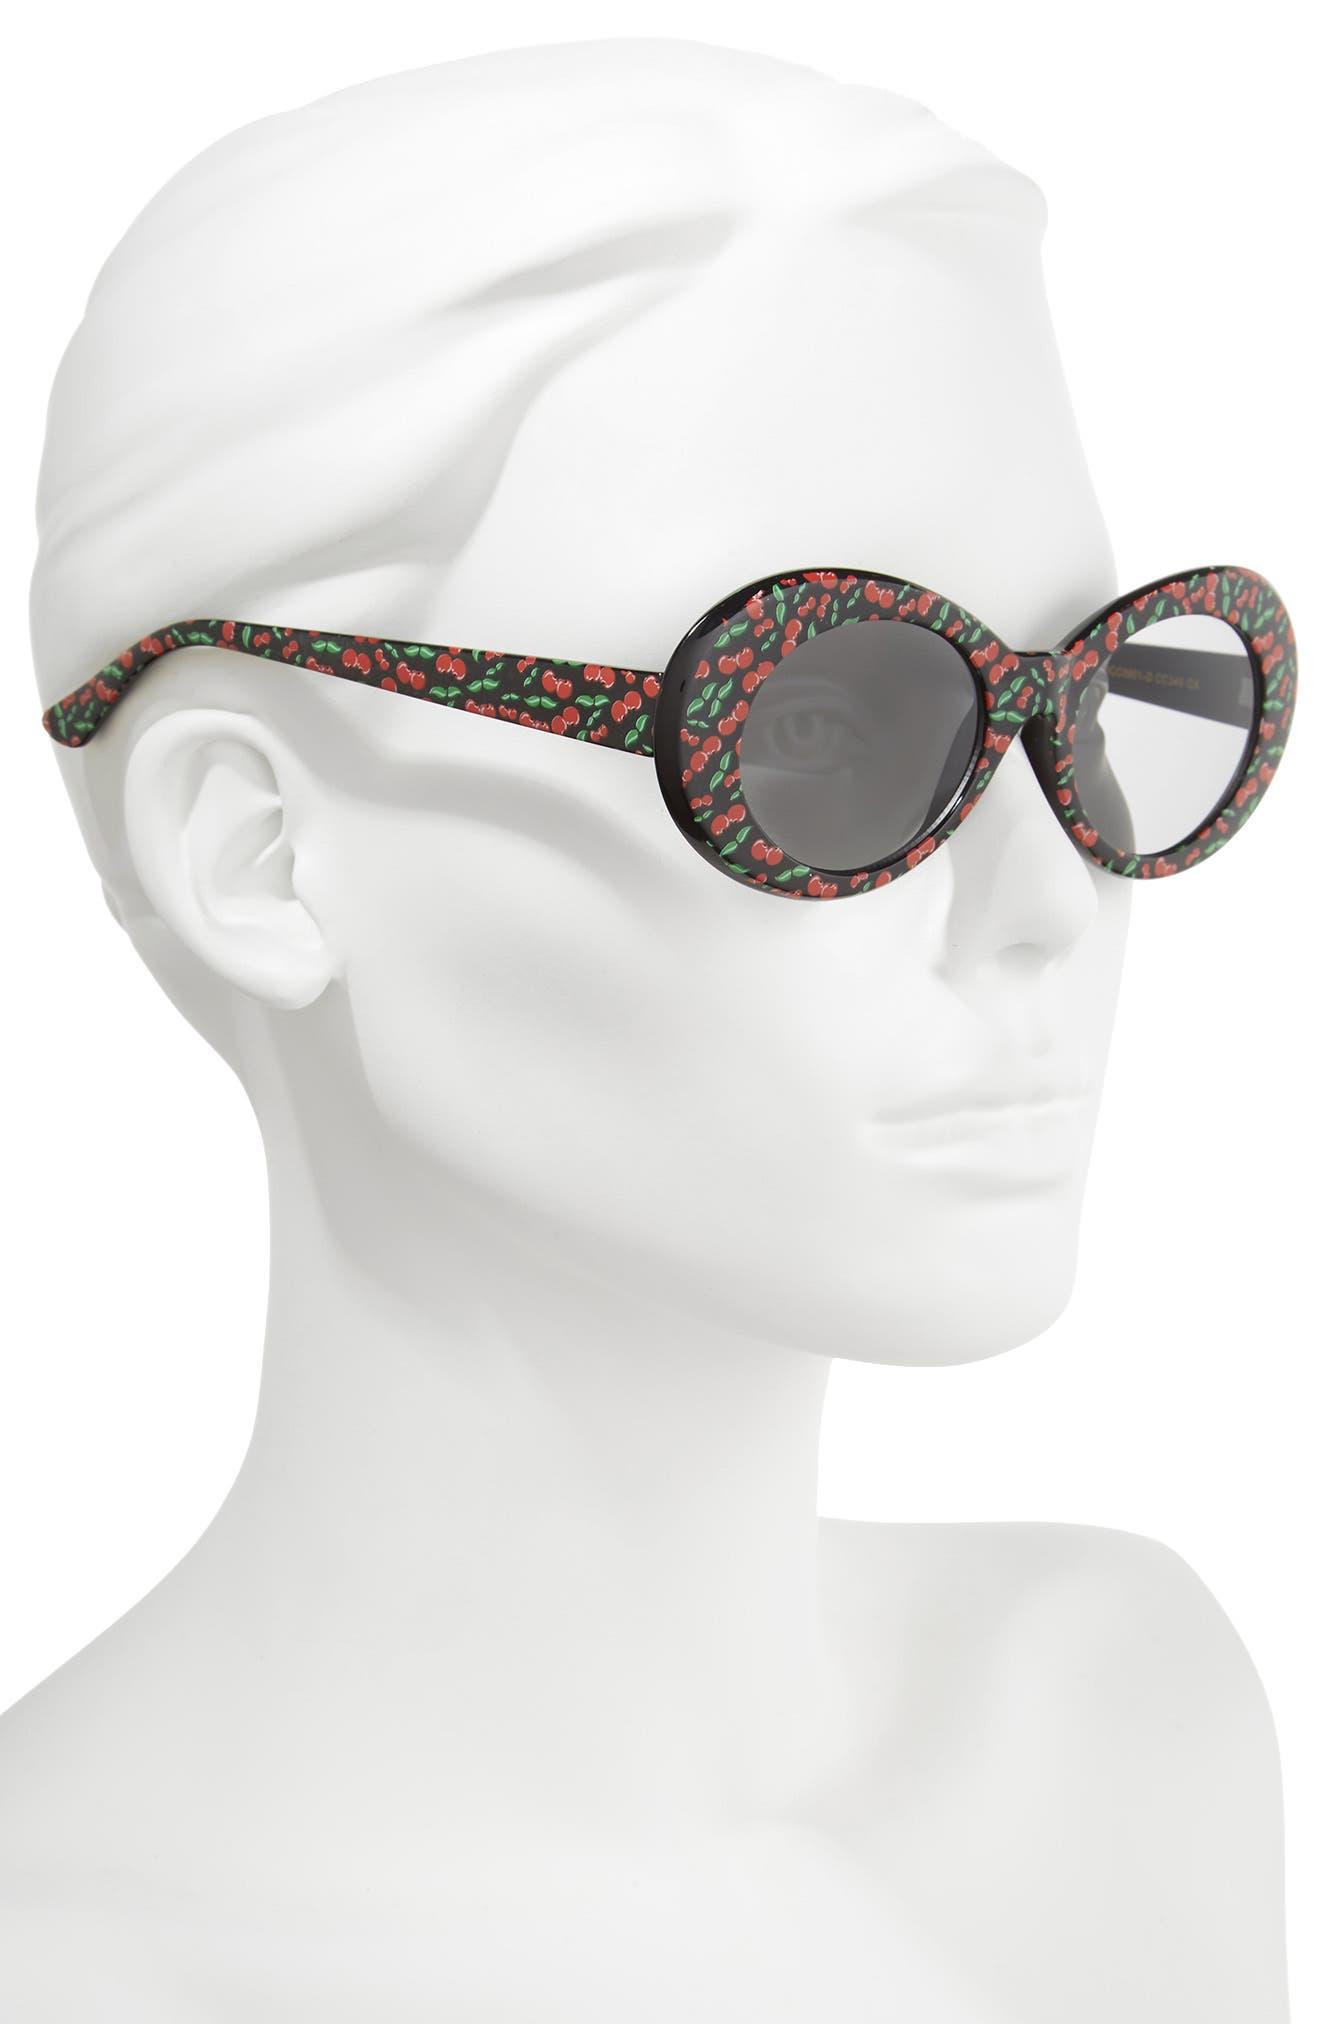 50mm Cherry Print Oval Sunglasses,                             Alternate thumbnail 2, color,                             Black/ Cherry Print